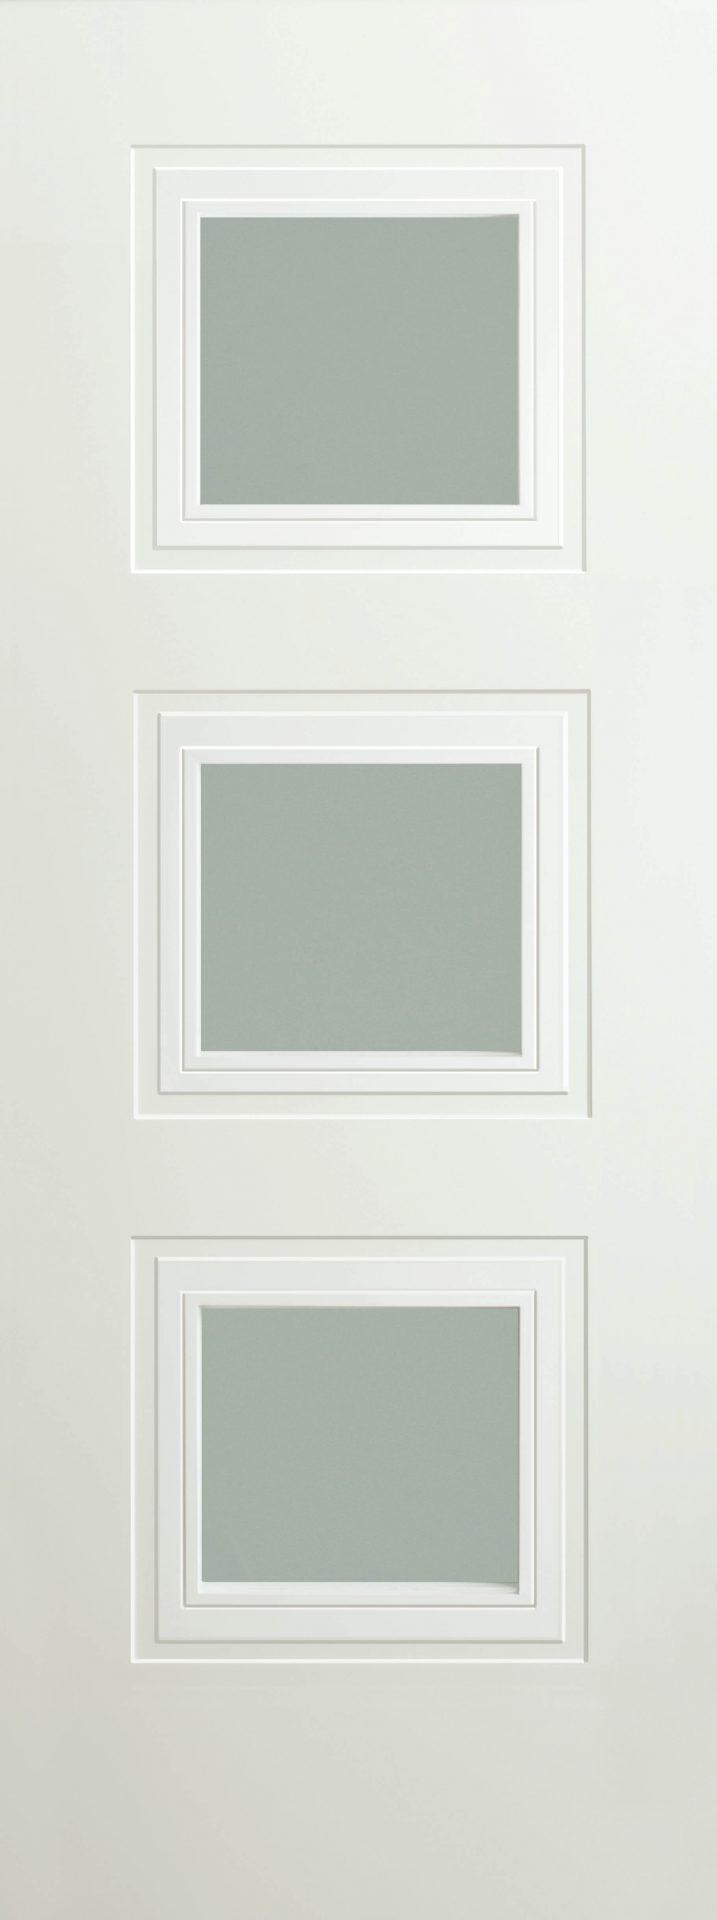 Bergerac 3p white opal laminate glass